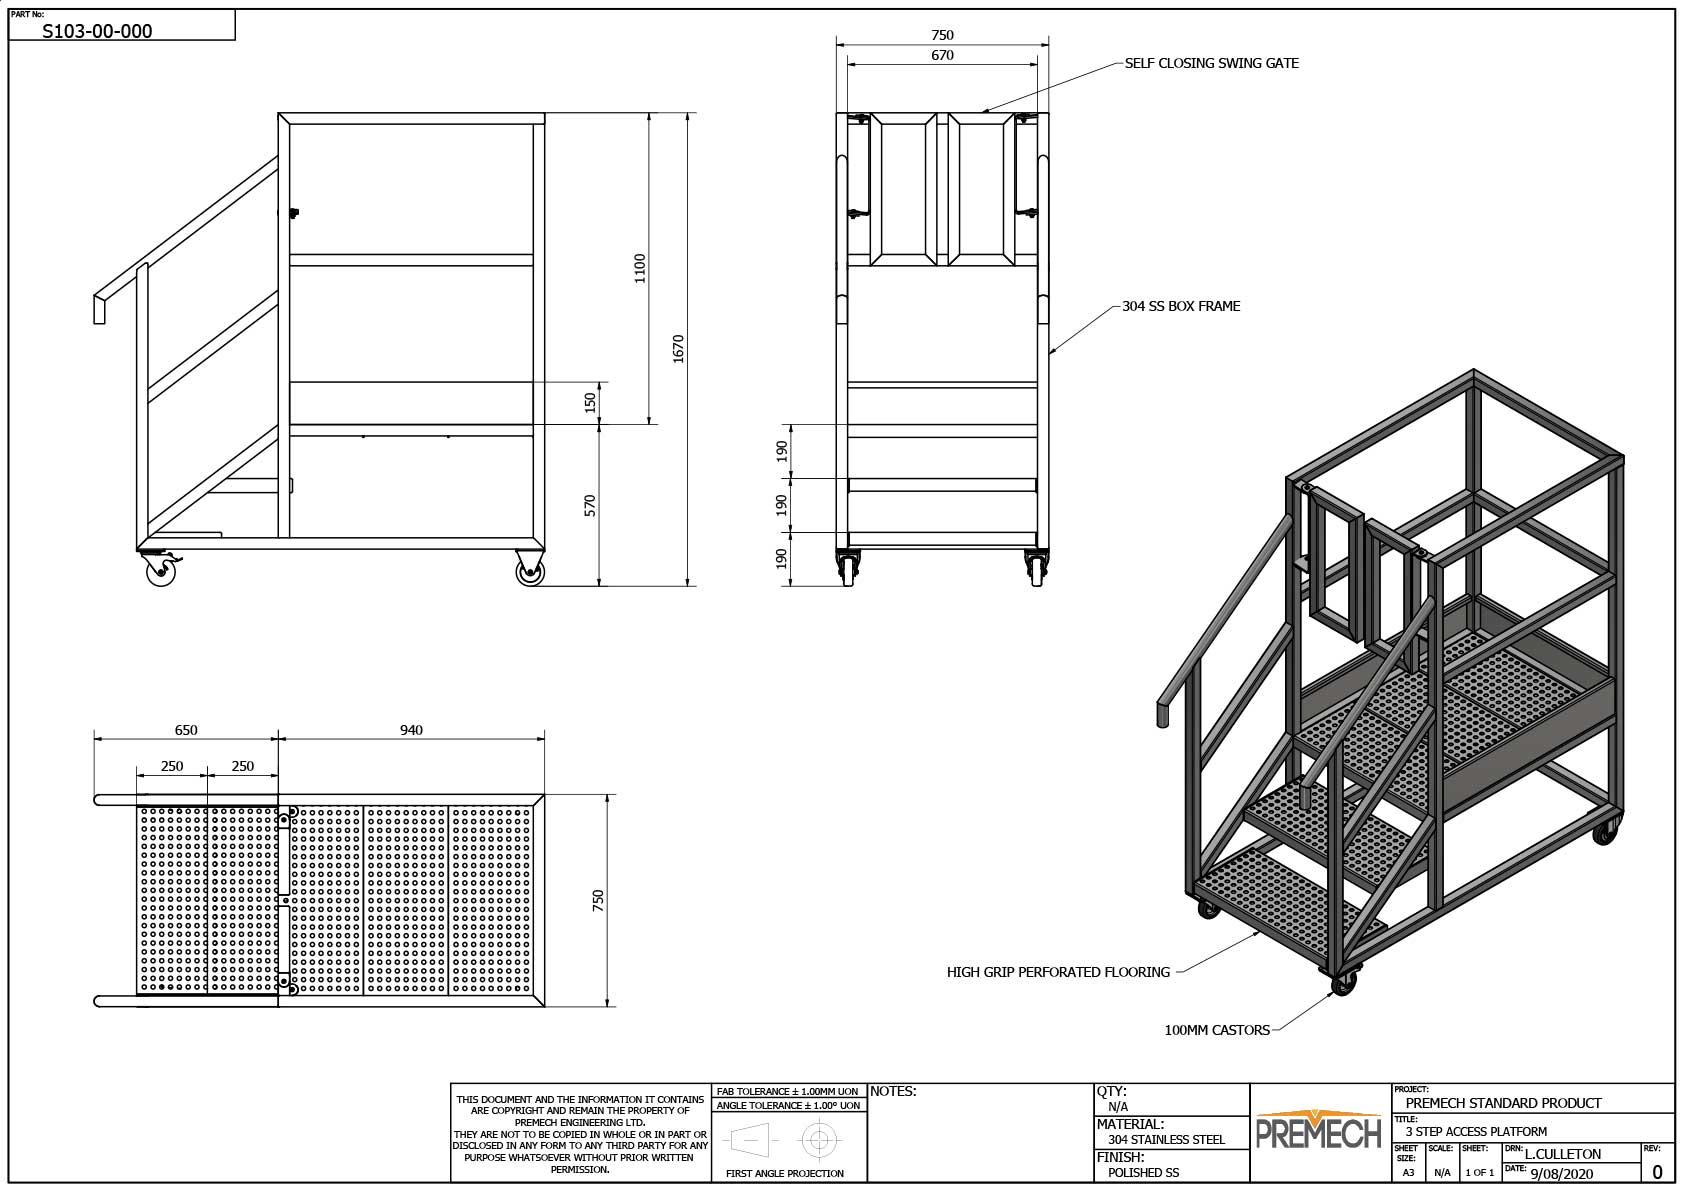 Stainless Steel Access Platform 3 Step